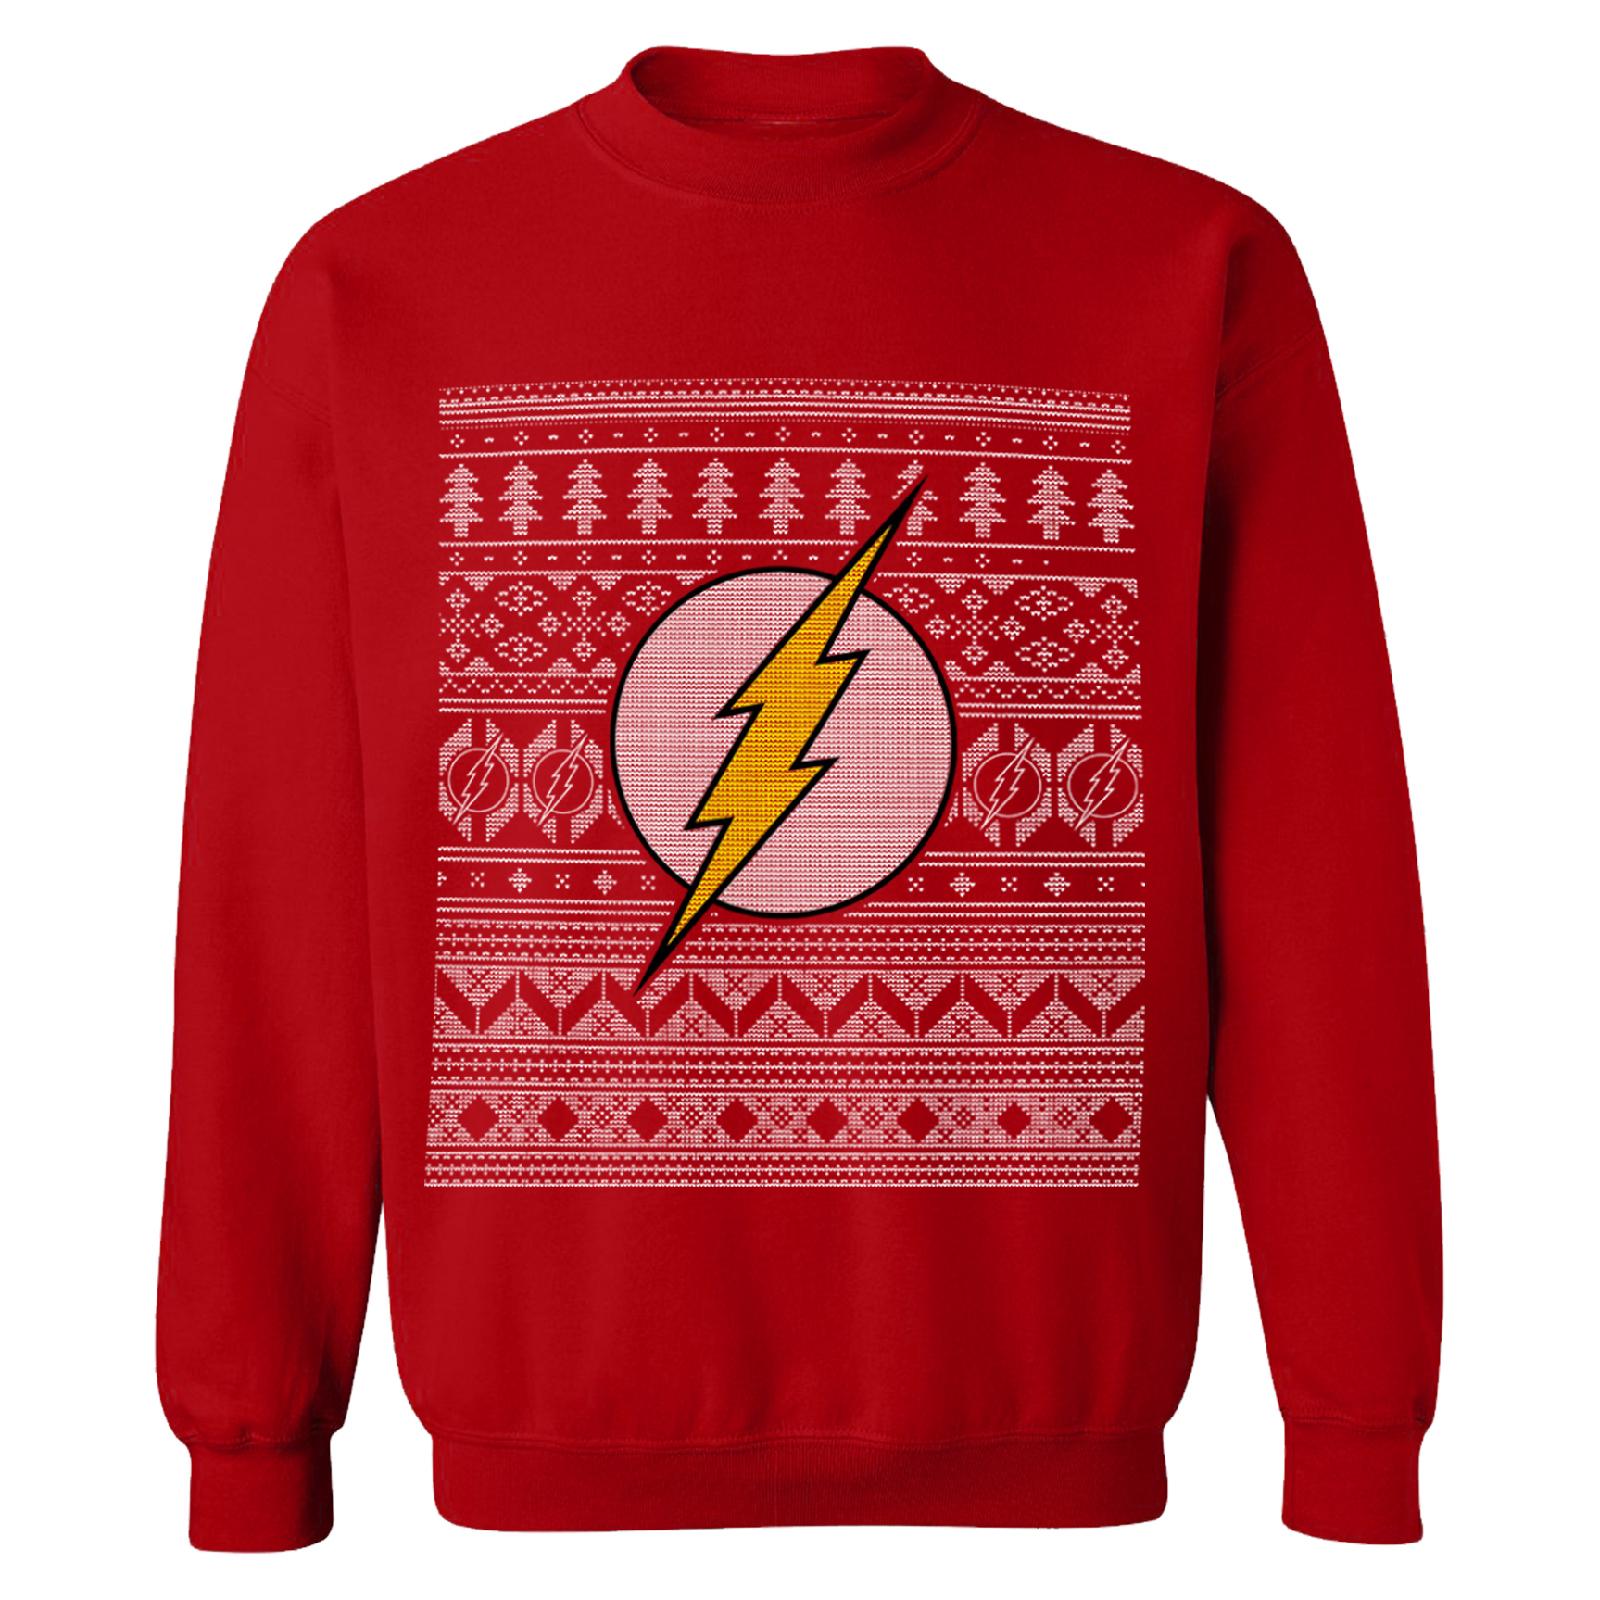 Gaming Kersttrui.Dc Comics Men S The Flash Christmas Fairisle Sweatshirt Red